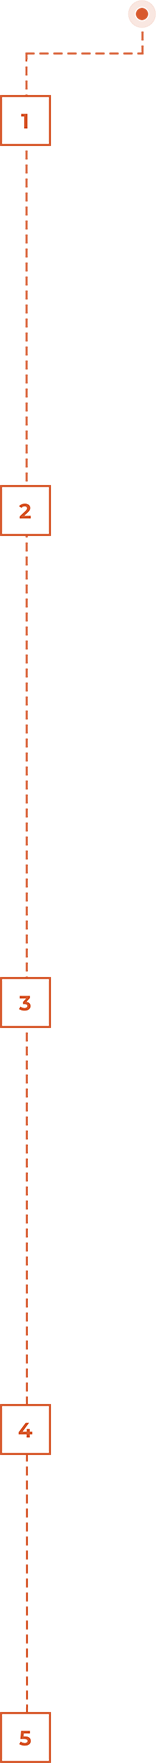 timeline graphic sm